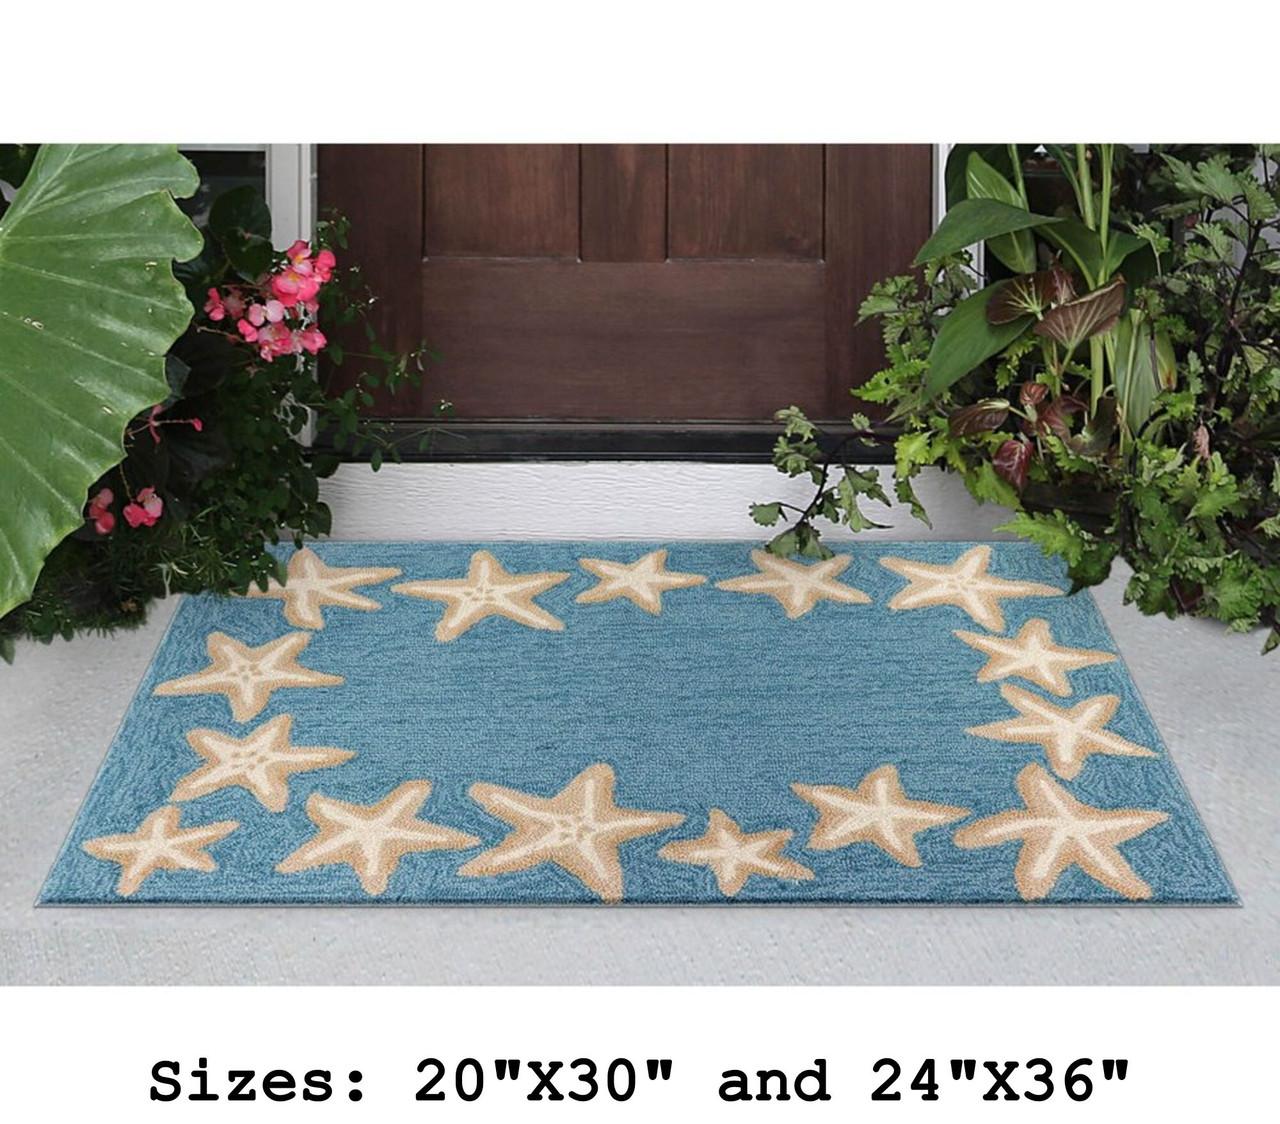 Aqua Capri Starfish Border Indoor/Outdoor Rug -  Small Rectangle Lifestyle